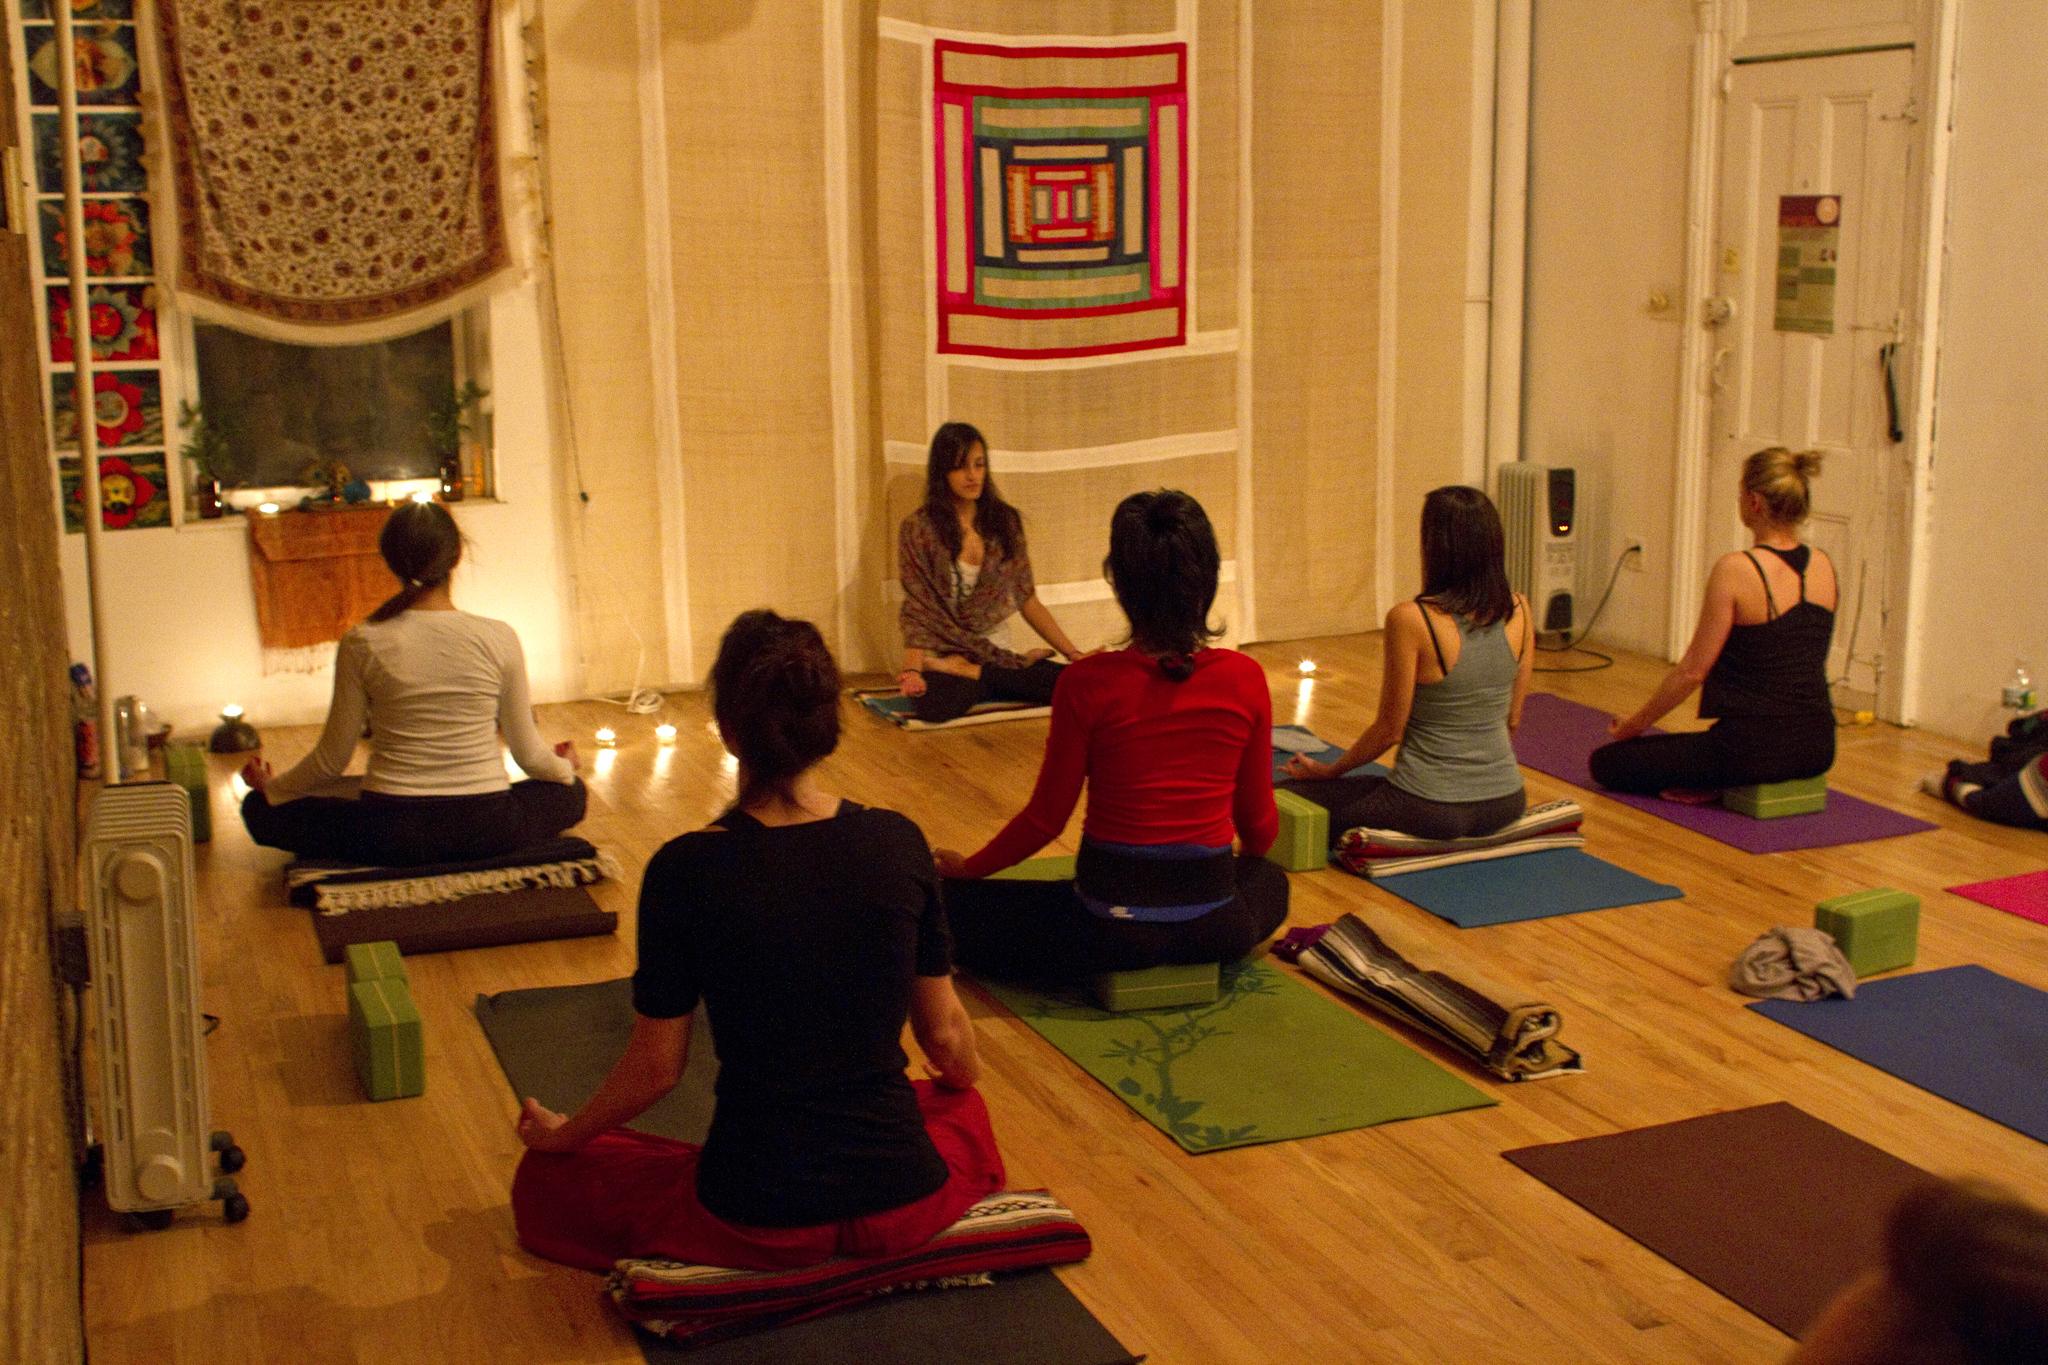 Greenhouse Holistic: Signature massage